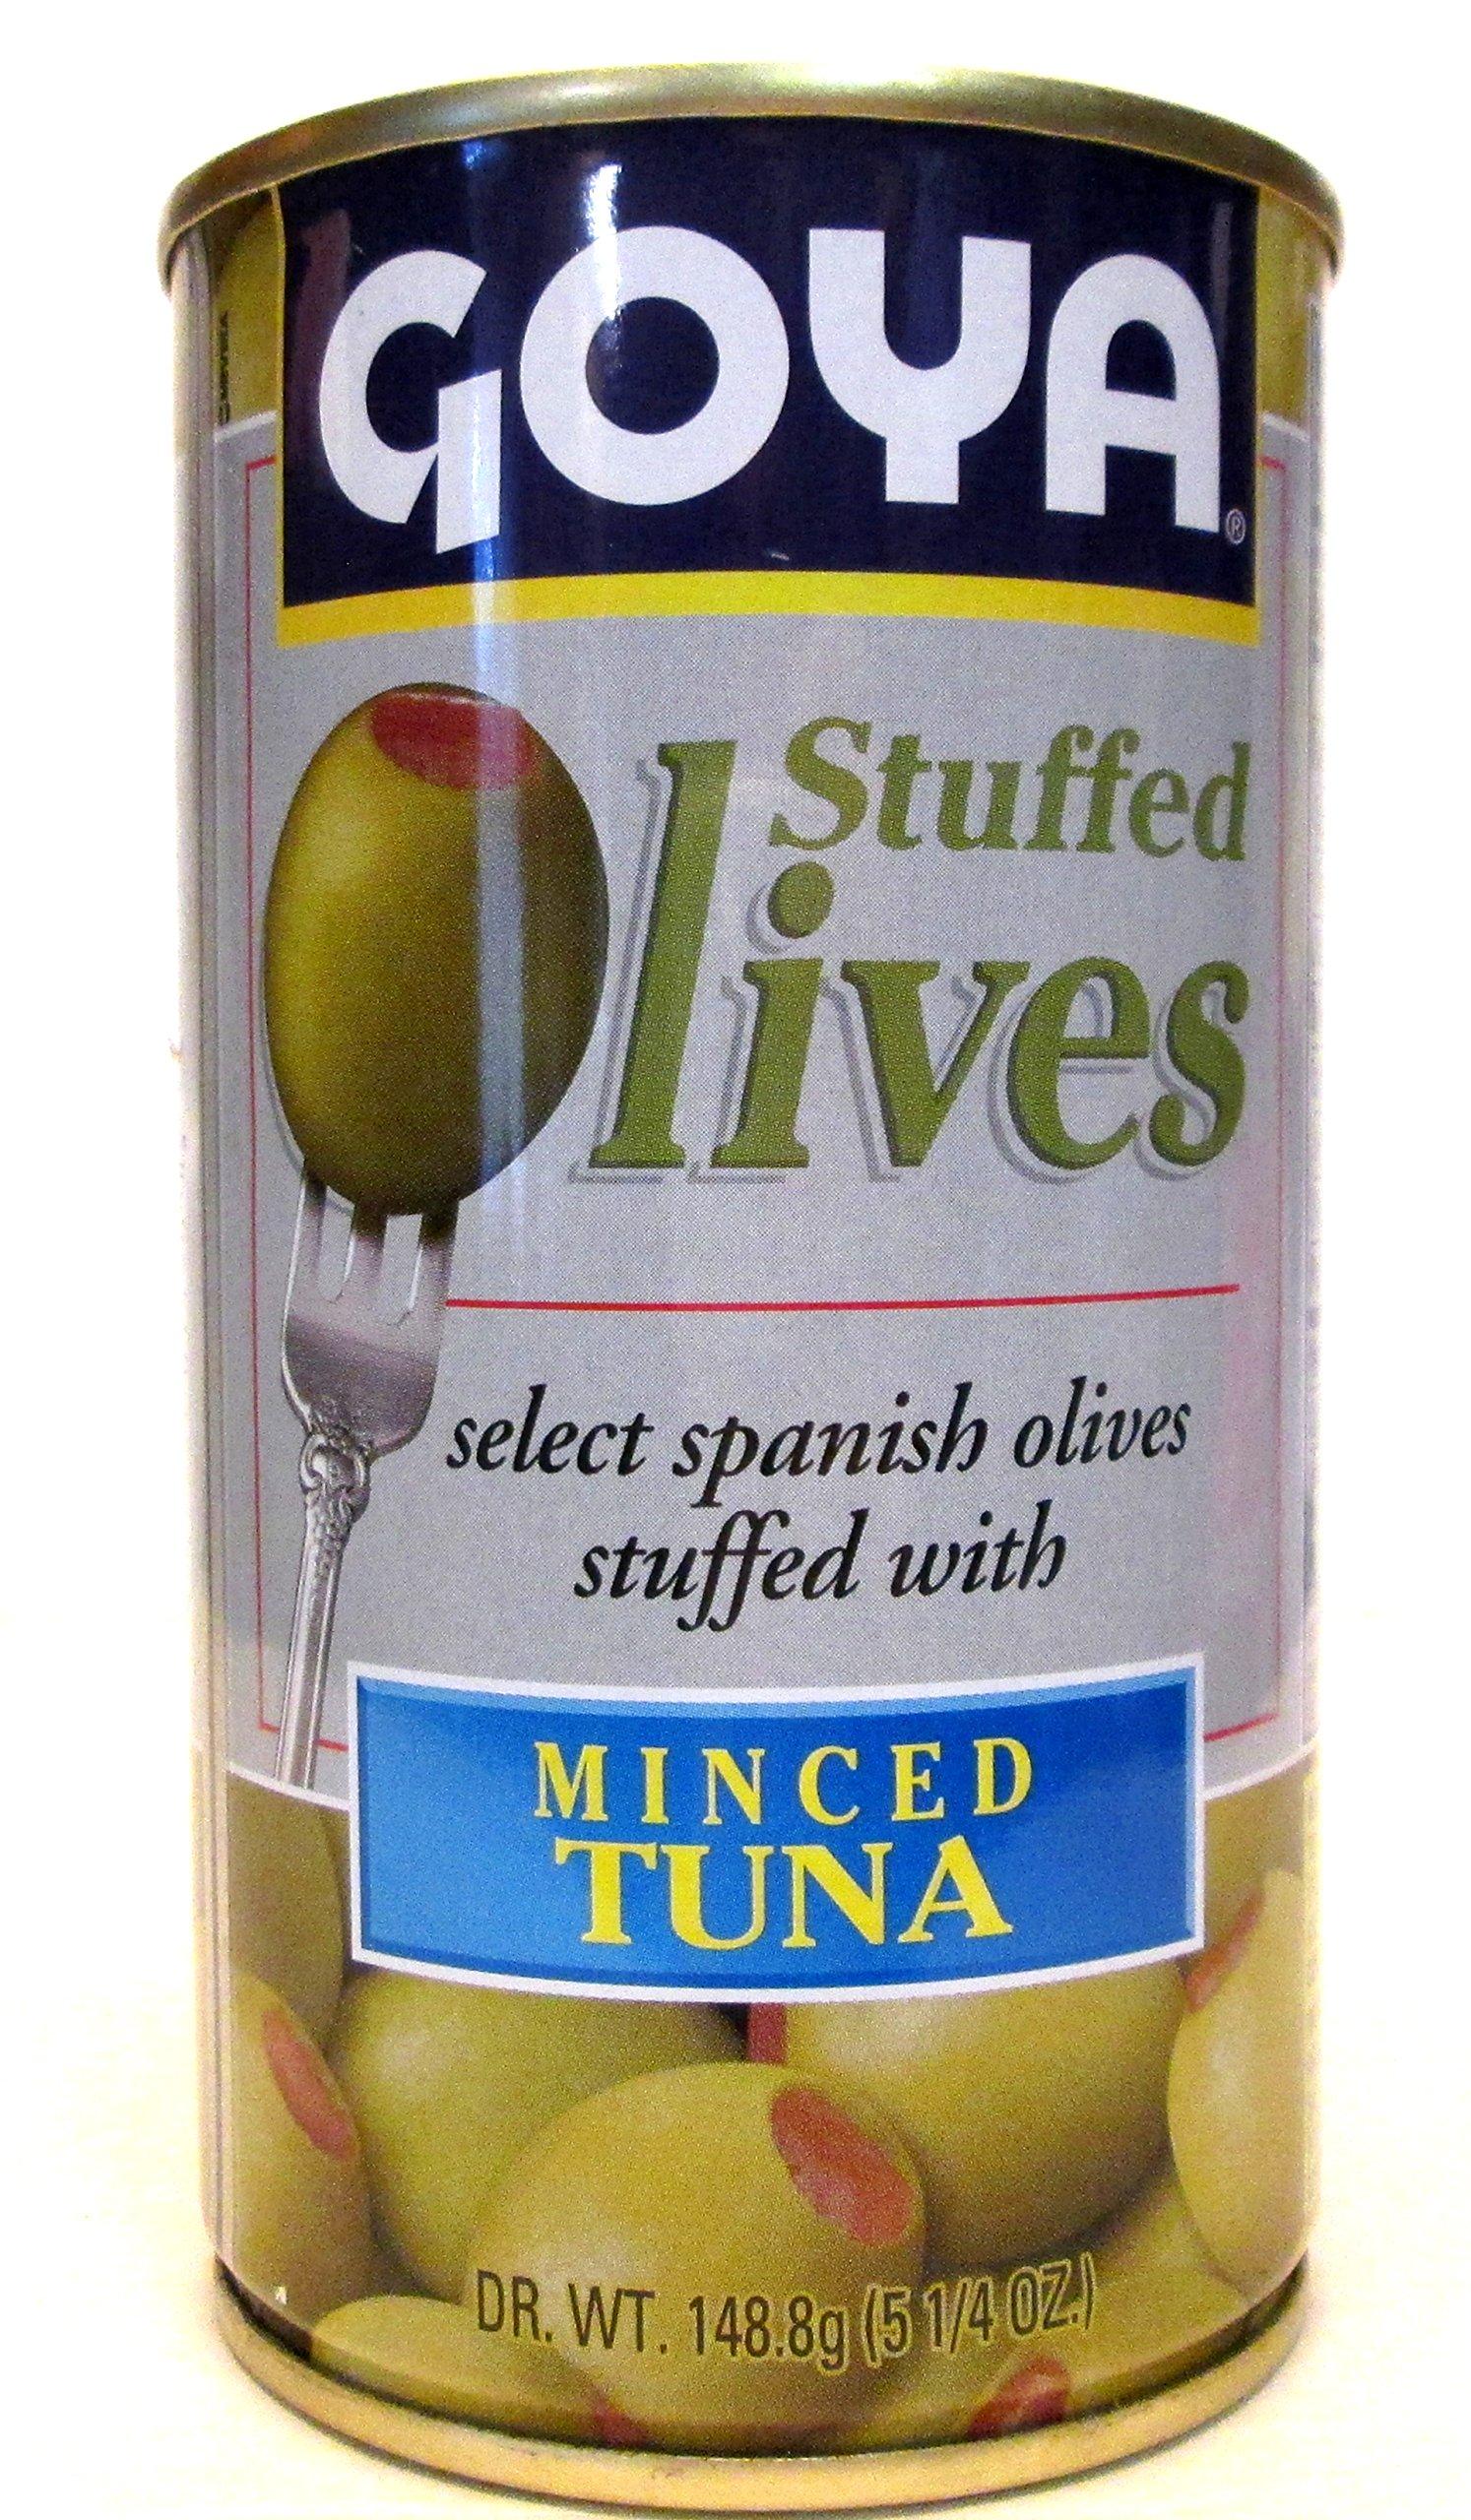 Goya Minced Tuna Stuffed Spanish Olives (Pack of 2) 5.25 oz Cans